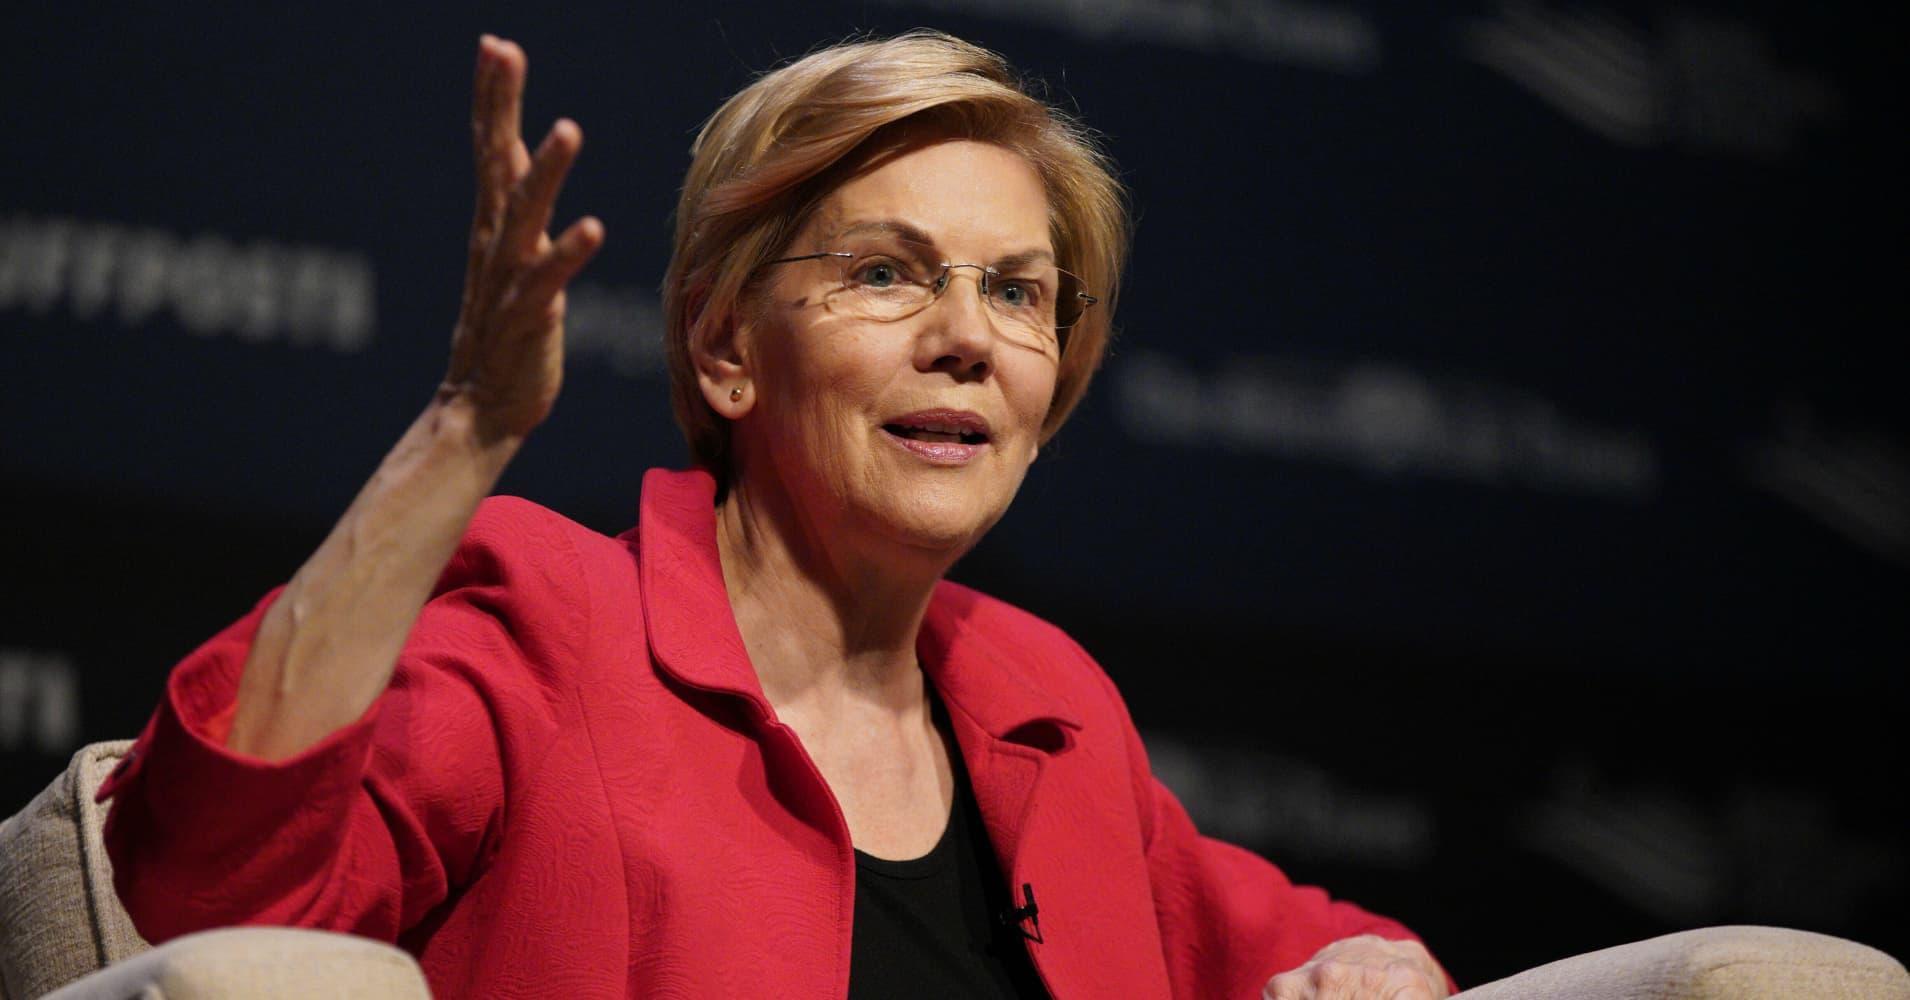 Big agriculture fights back against Sen. Elizabeth Warren's call to break up industry